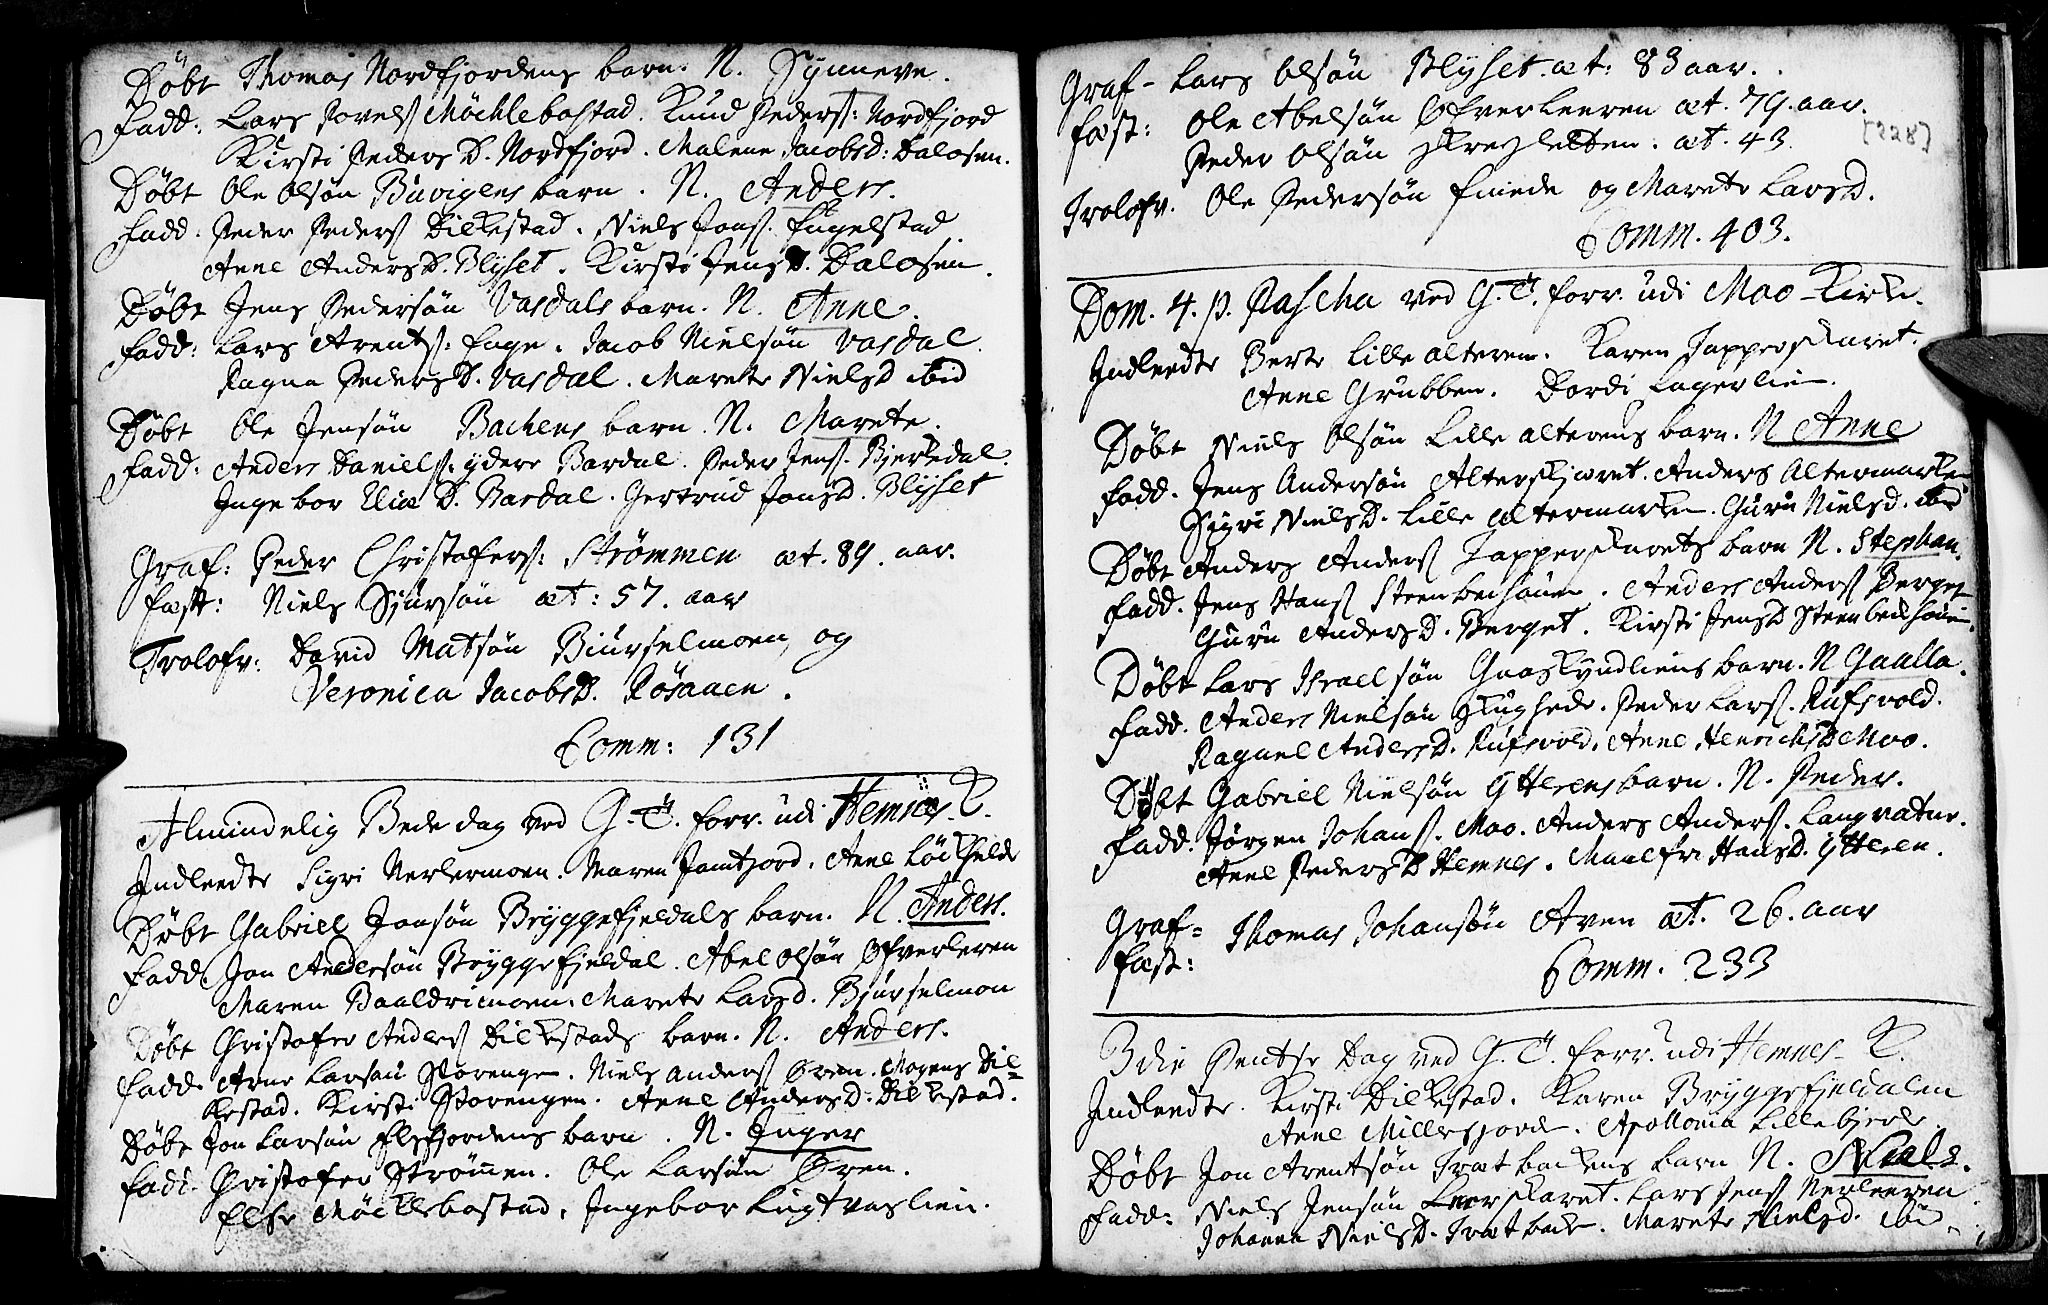 SAT, Ministerialprotokoller, klokkerbøker og fødselsregistre - Nordland, 825/L0345: Ministerialbok nr. 825A01, 1704-1728, s. 228